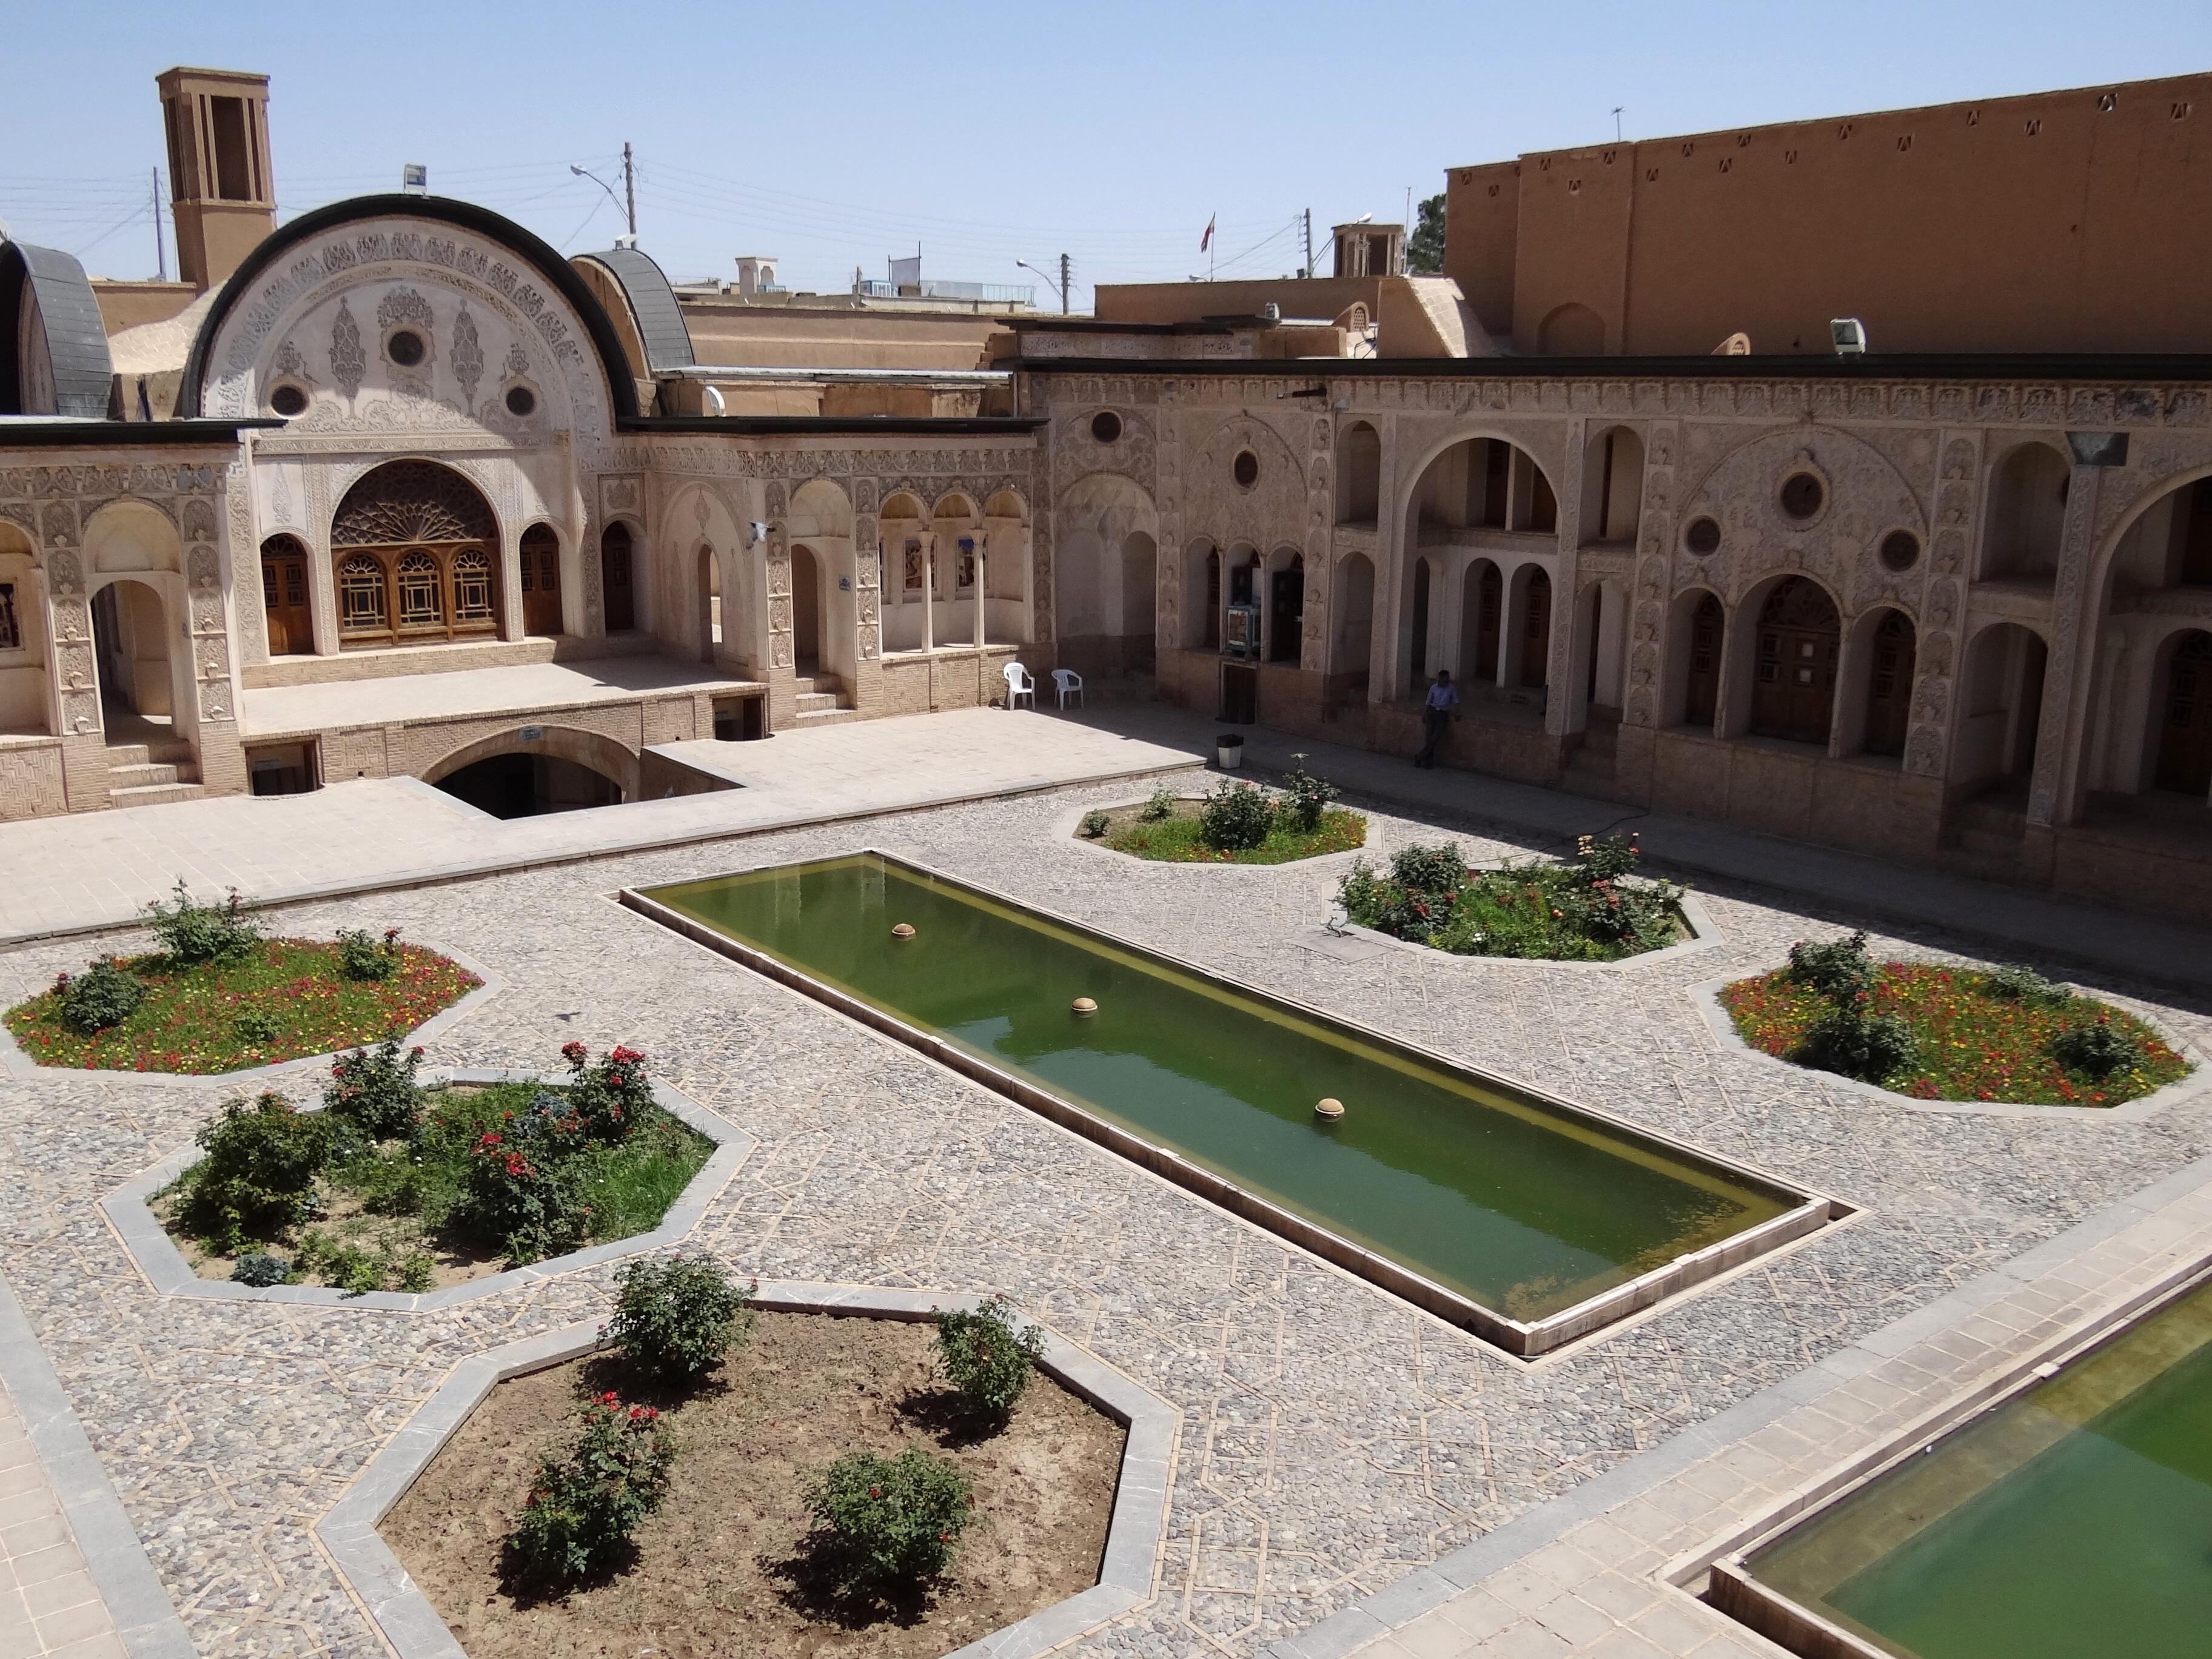 https://upload.wikimedia.org/wikipedia/commons/8/89/Courtyard_of_Tabatabei_Historical_House_Kashan.jpg